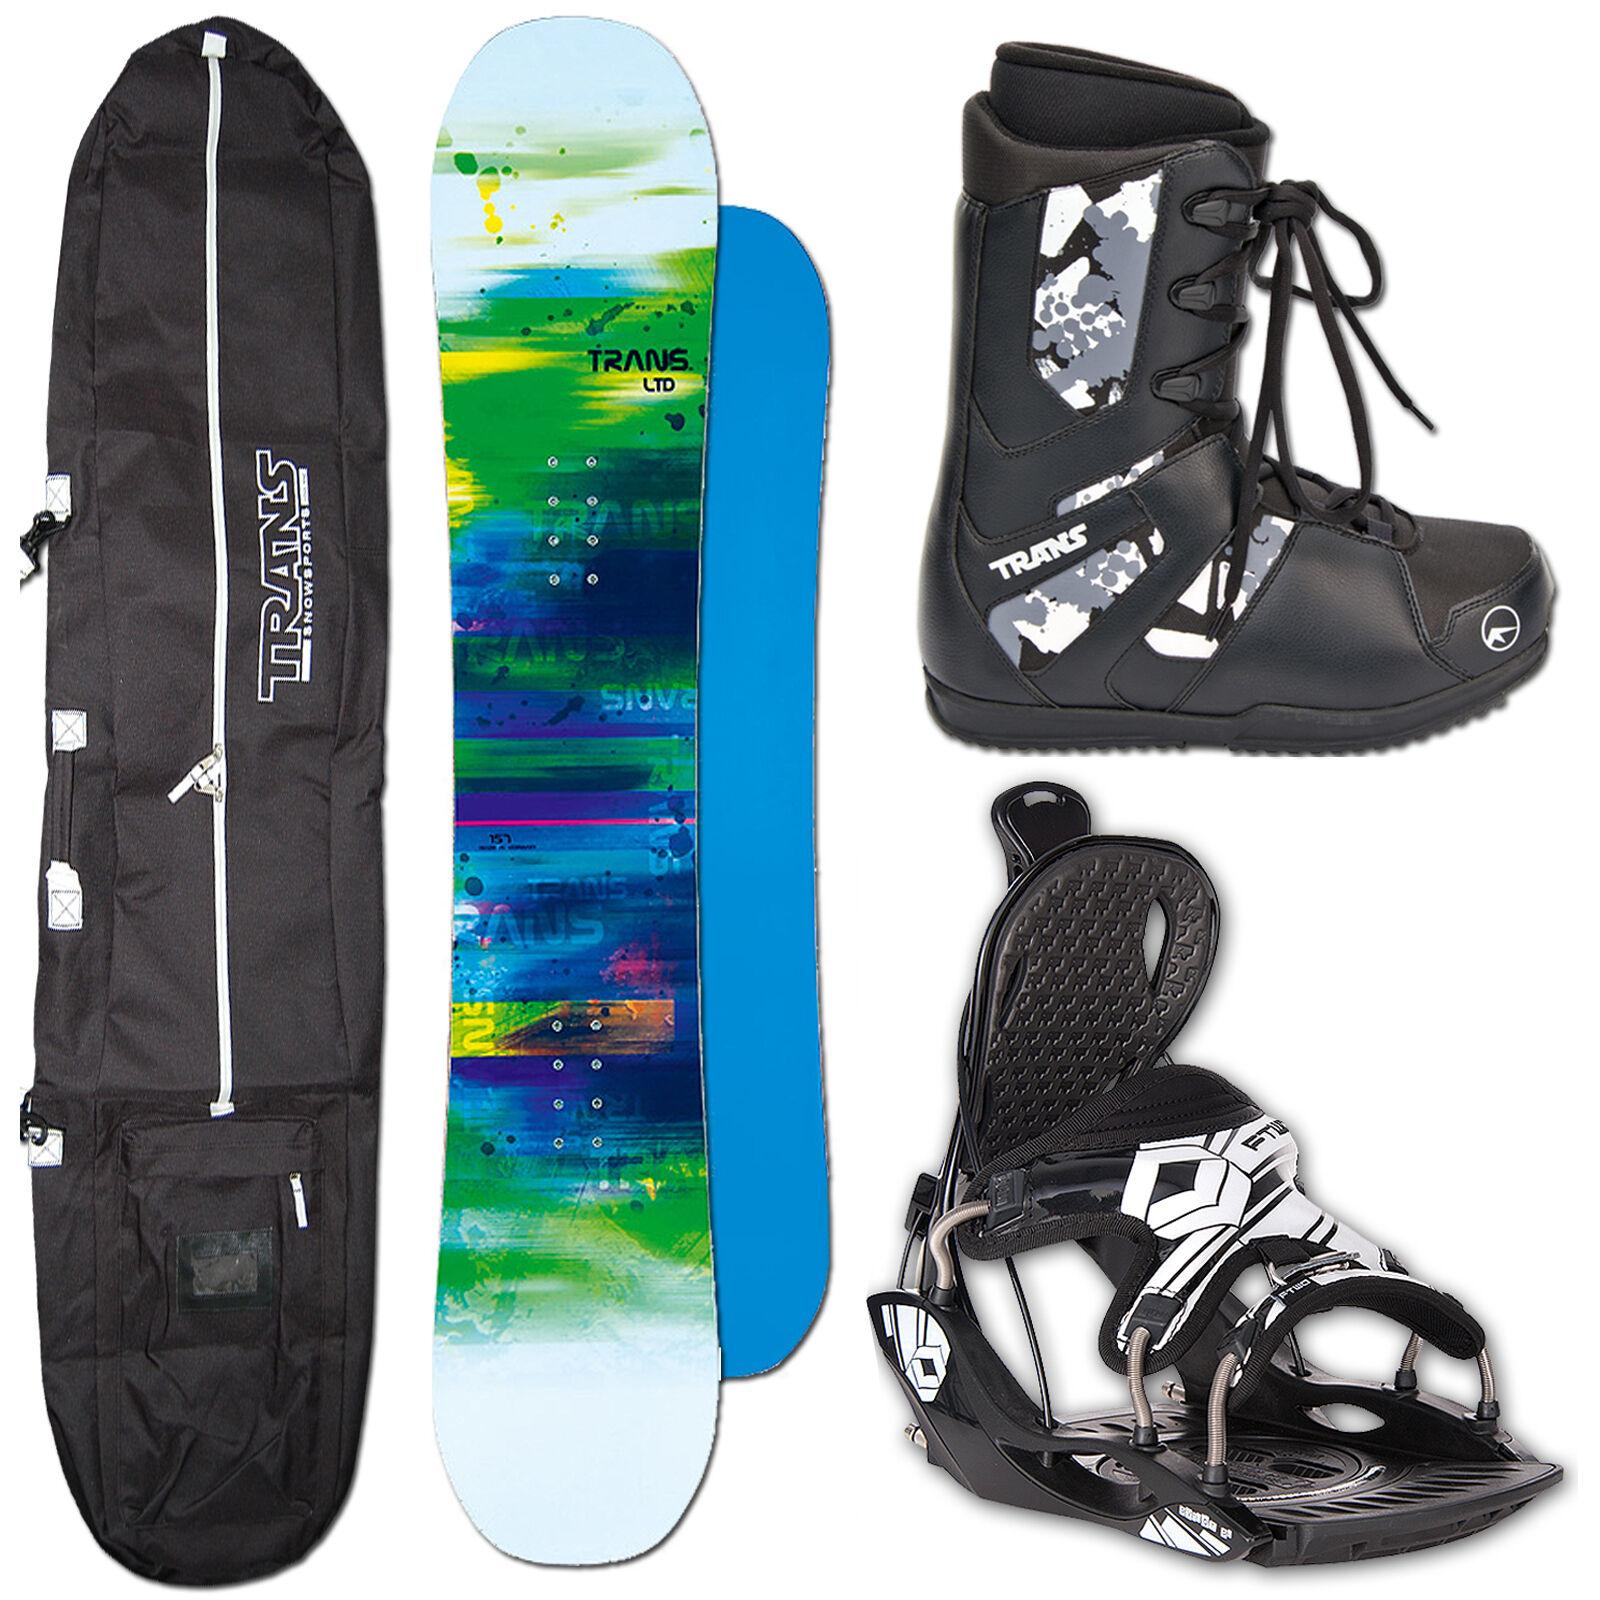 SNOWBOARD TRANS LTD WHITE 147 CM + FTWO PREMIUM BINDUNG M + BAG + BOOTS